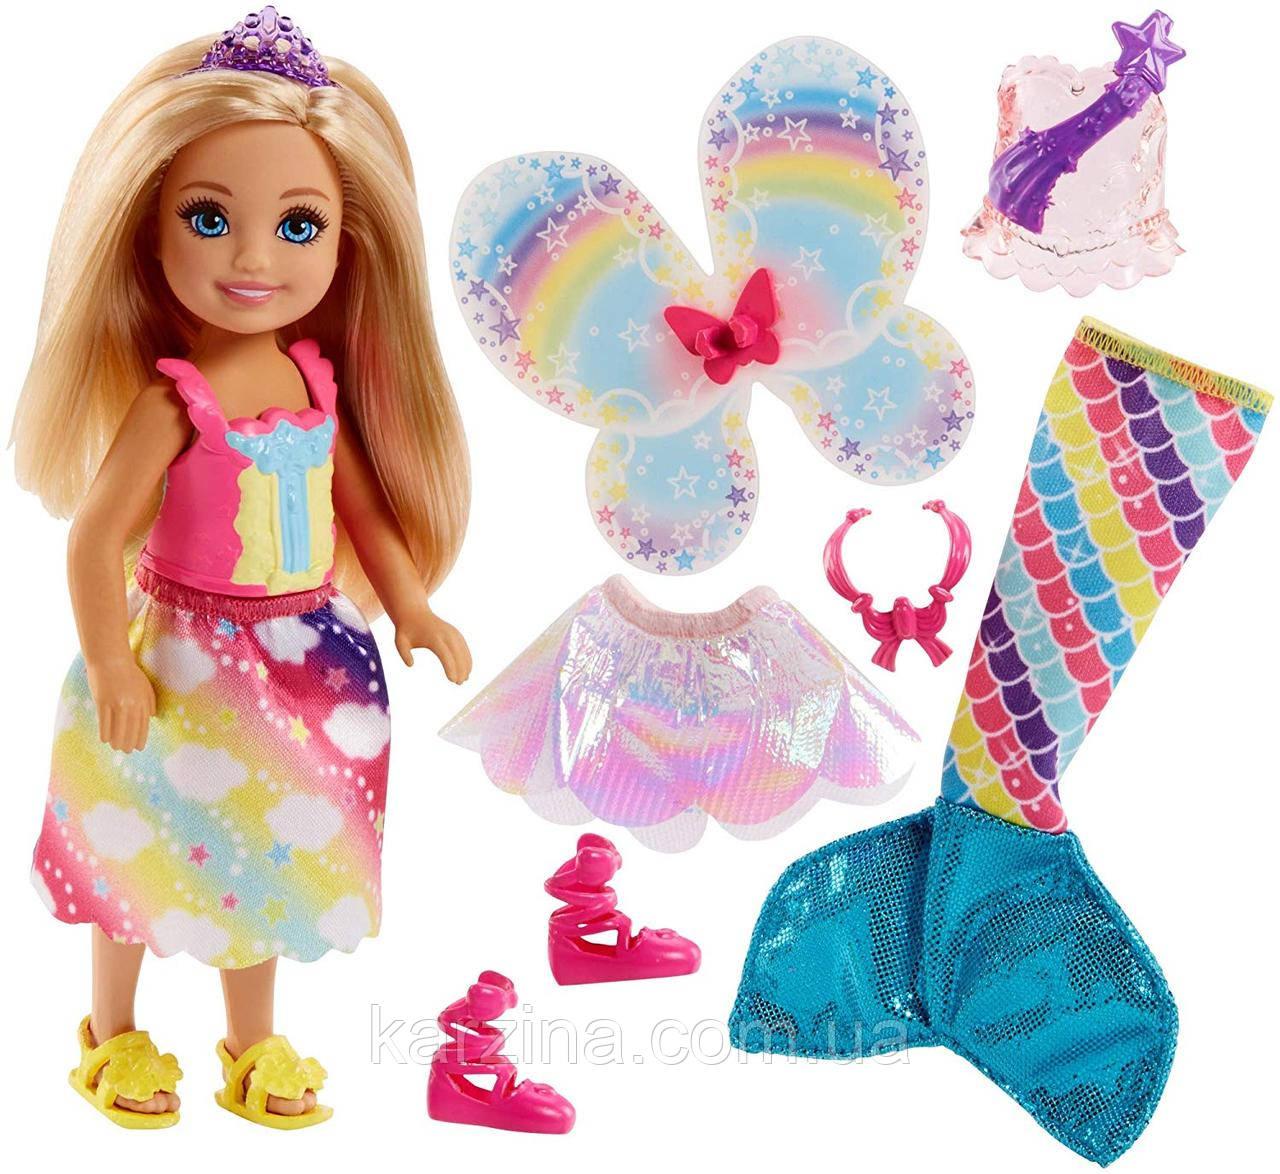 Кукла Челси с Дримтопии Радужной Бухты Barbie Dreamtopia Rainbow